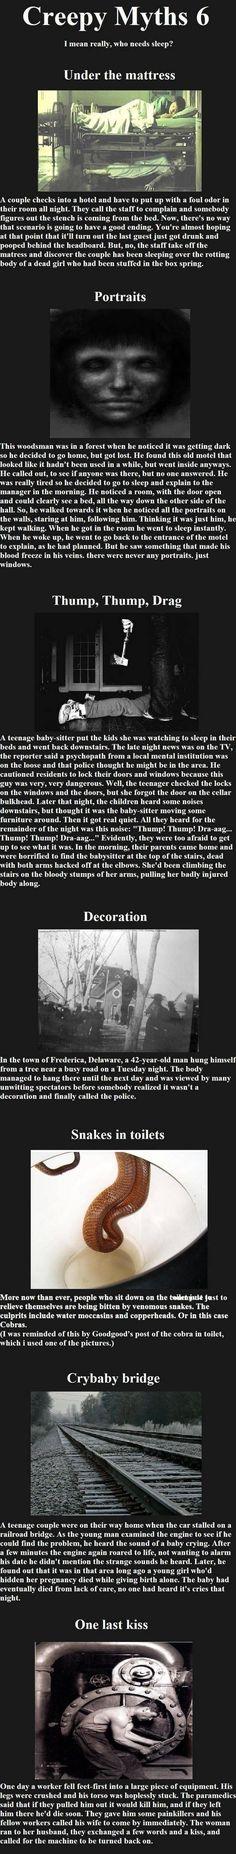 Creepy myth 6 (rp)